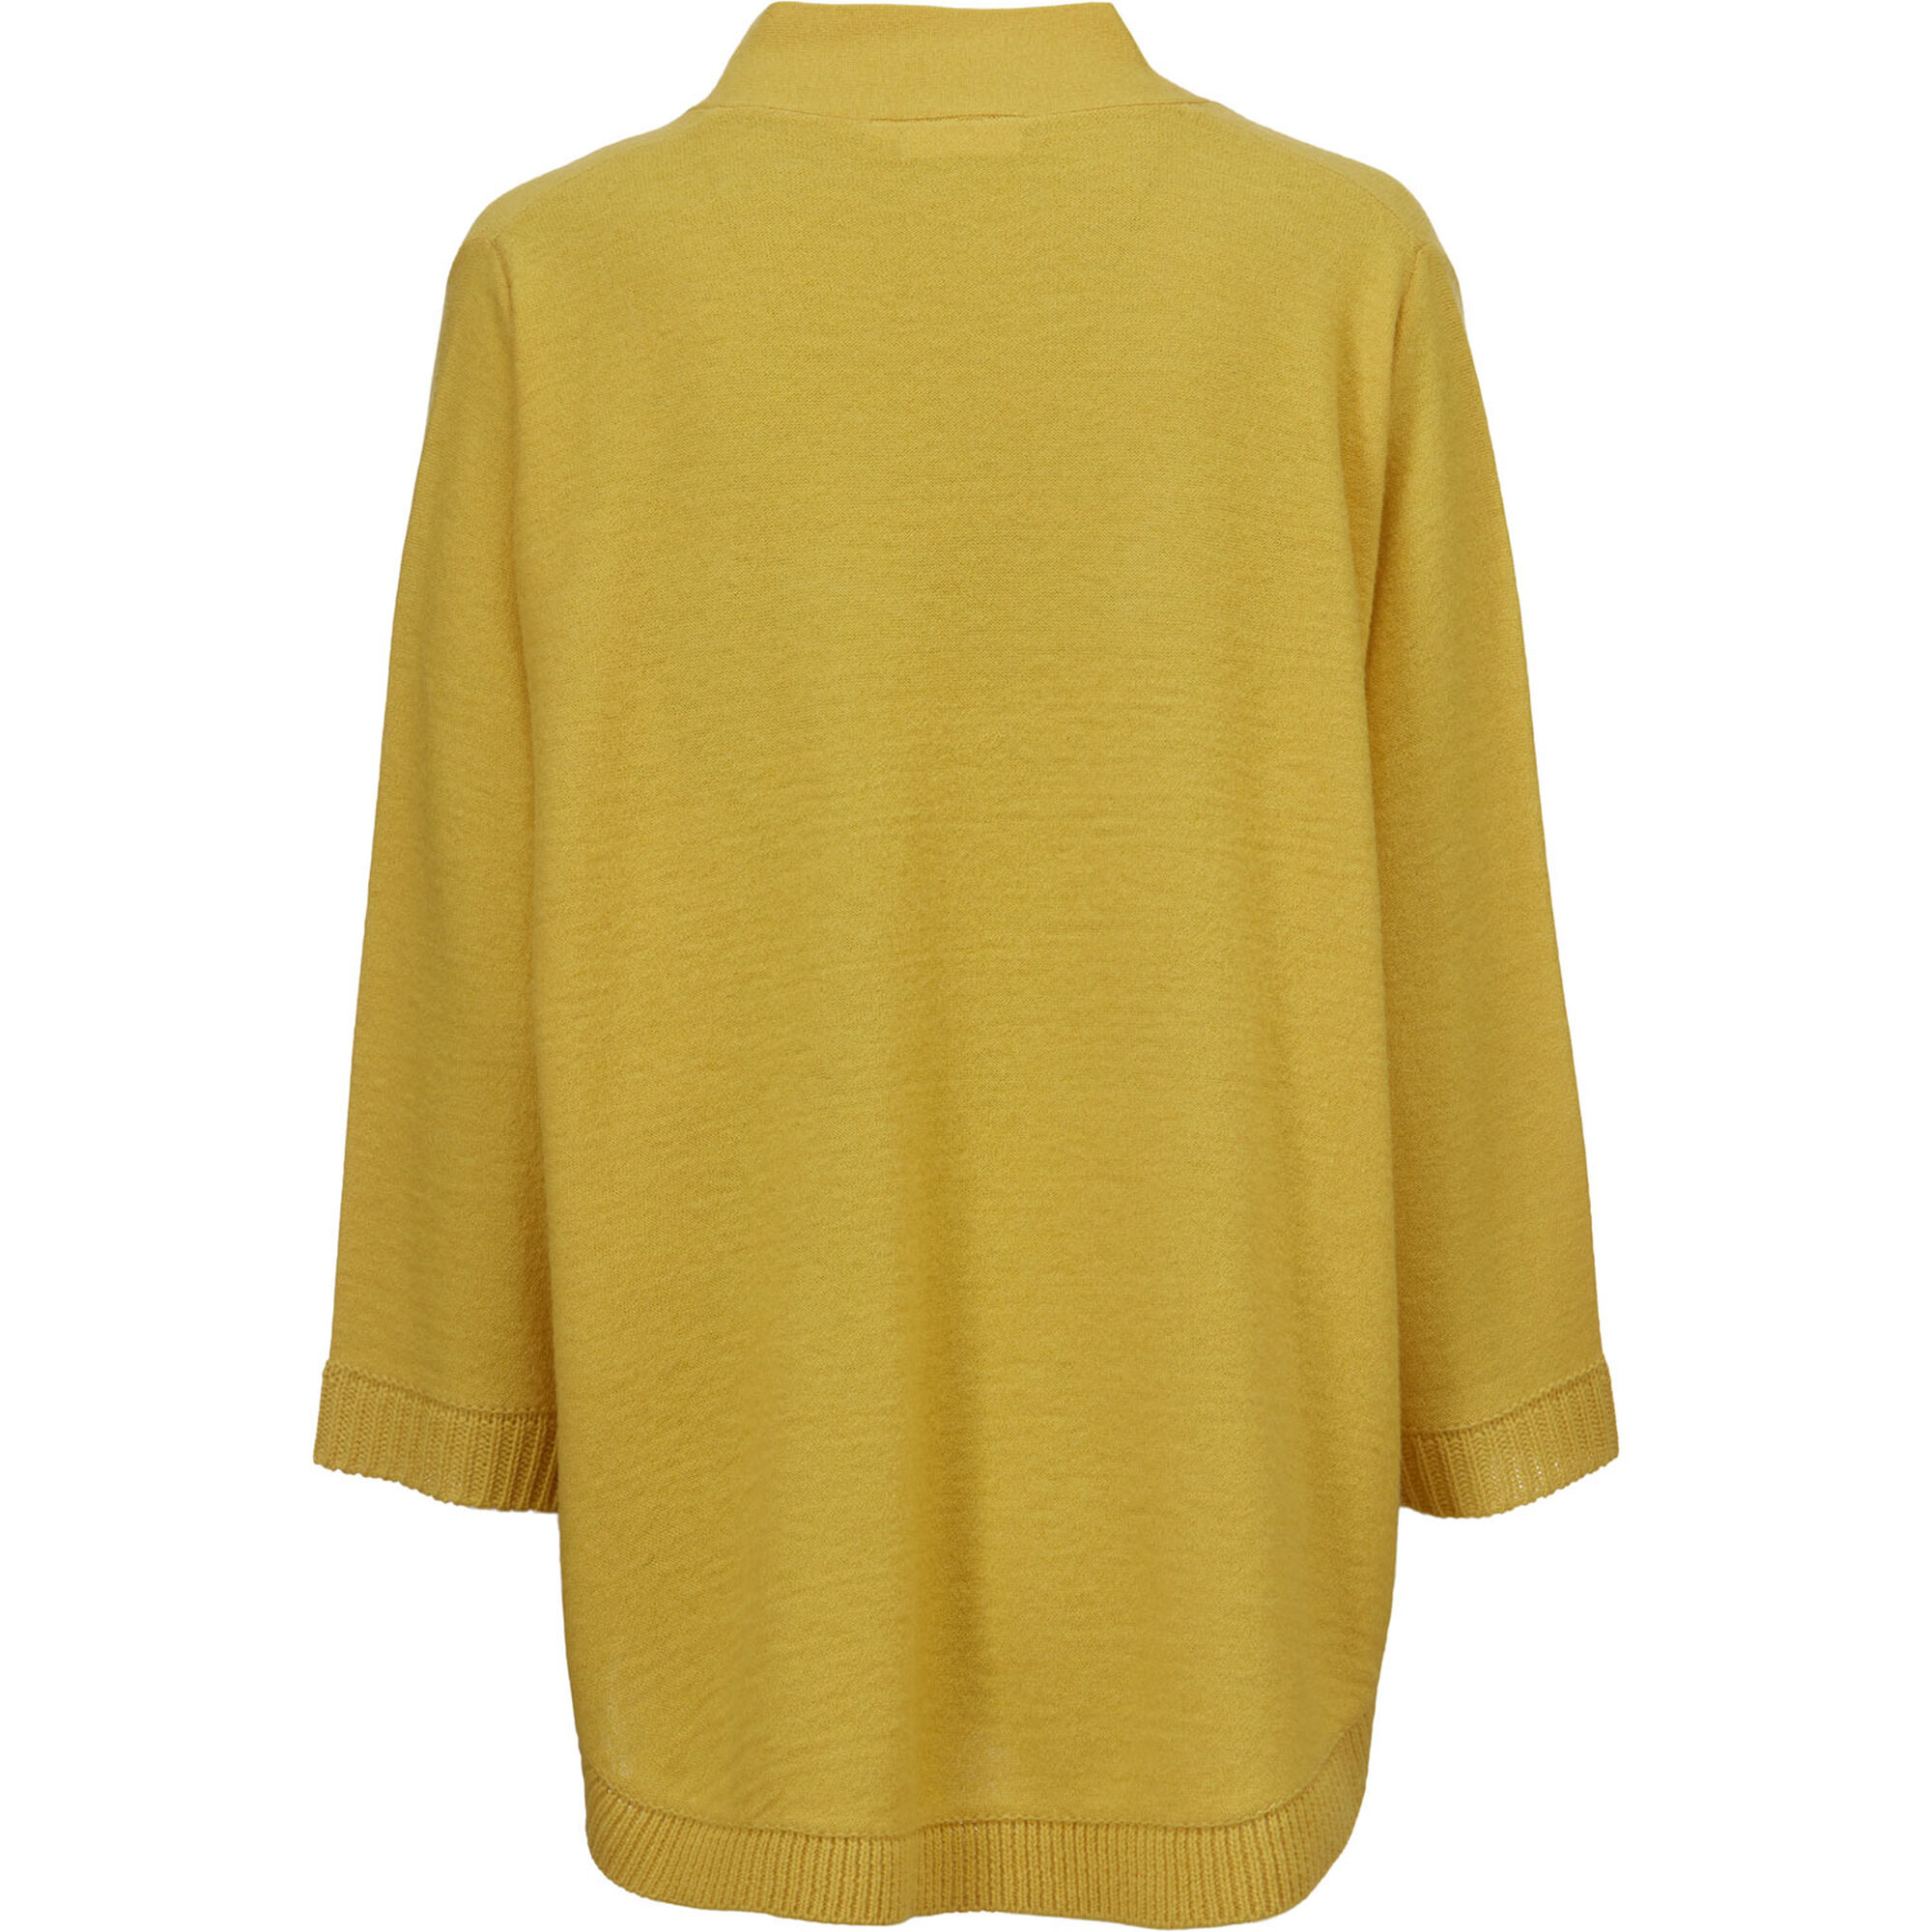 FAITHE TOPP, Oil Yellow, hi-res